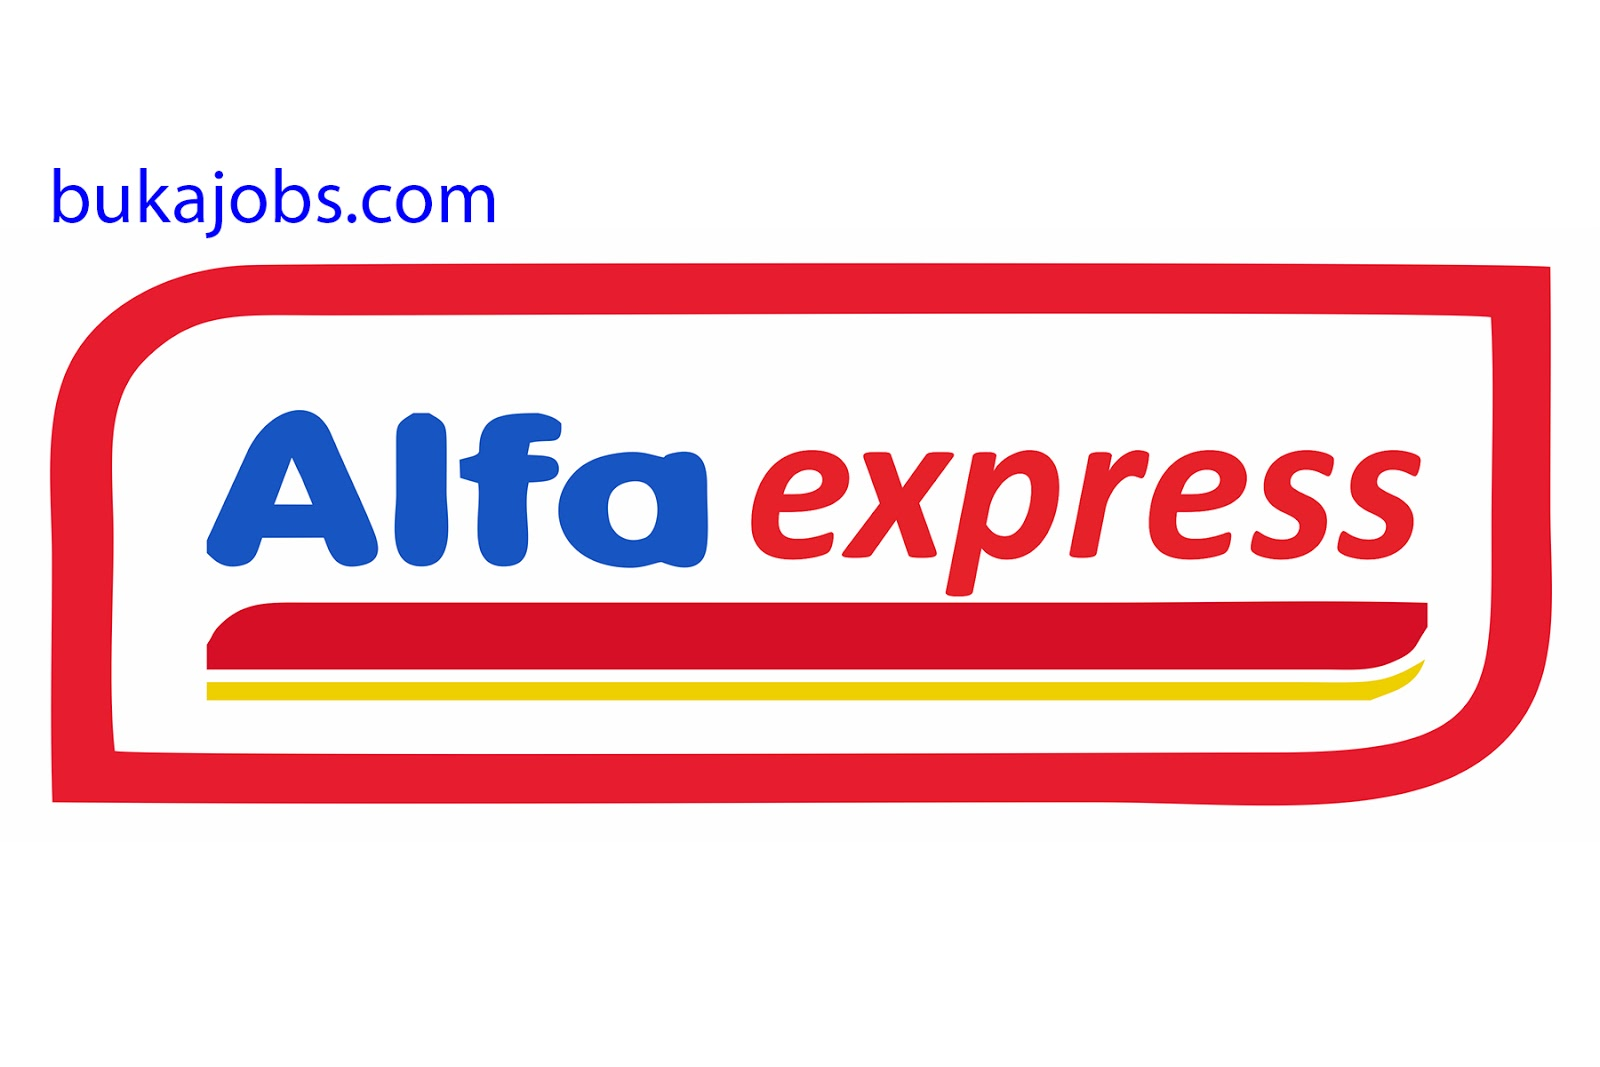 Lowongan Kerja Alfa Express 2019